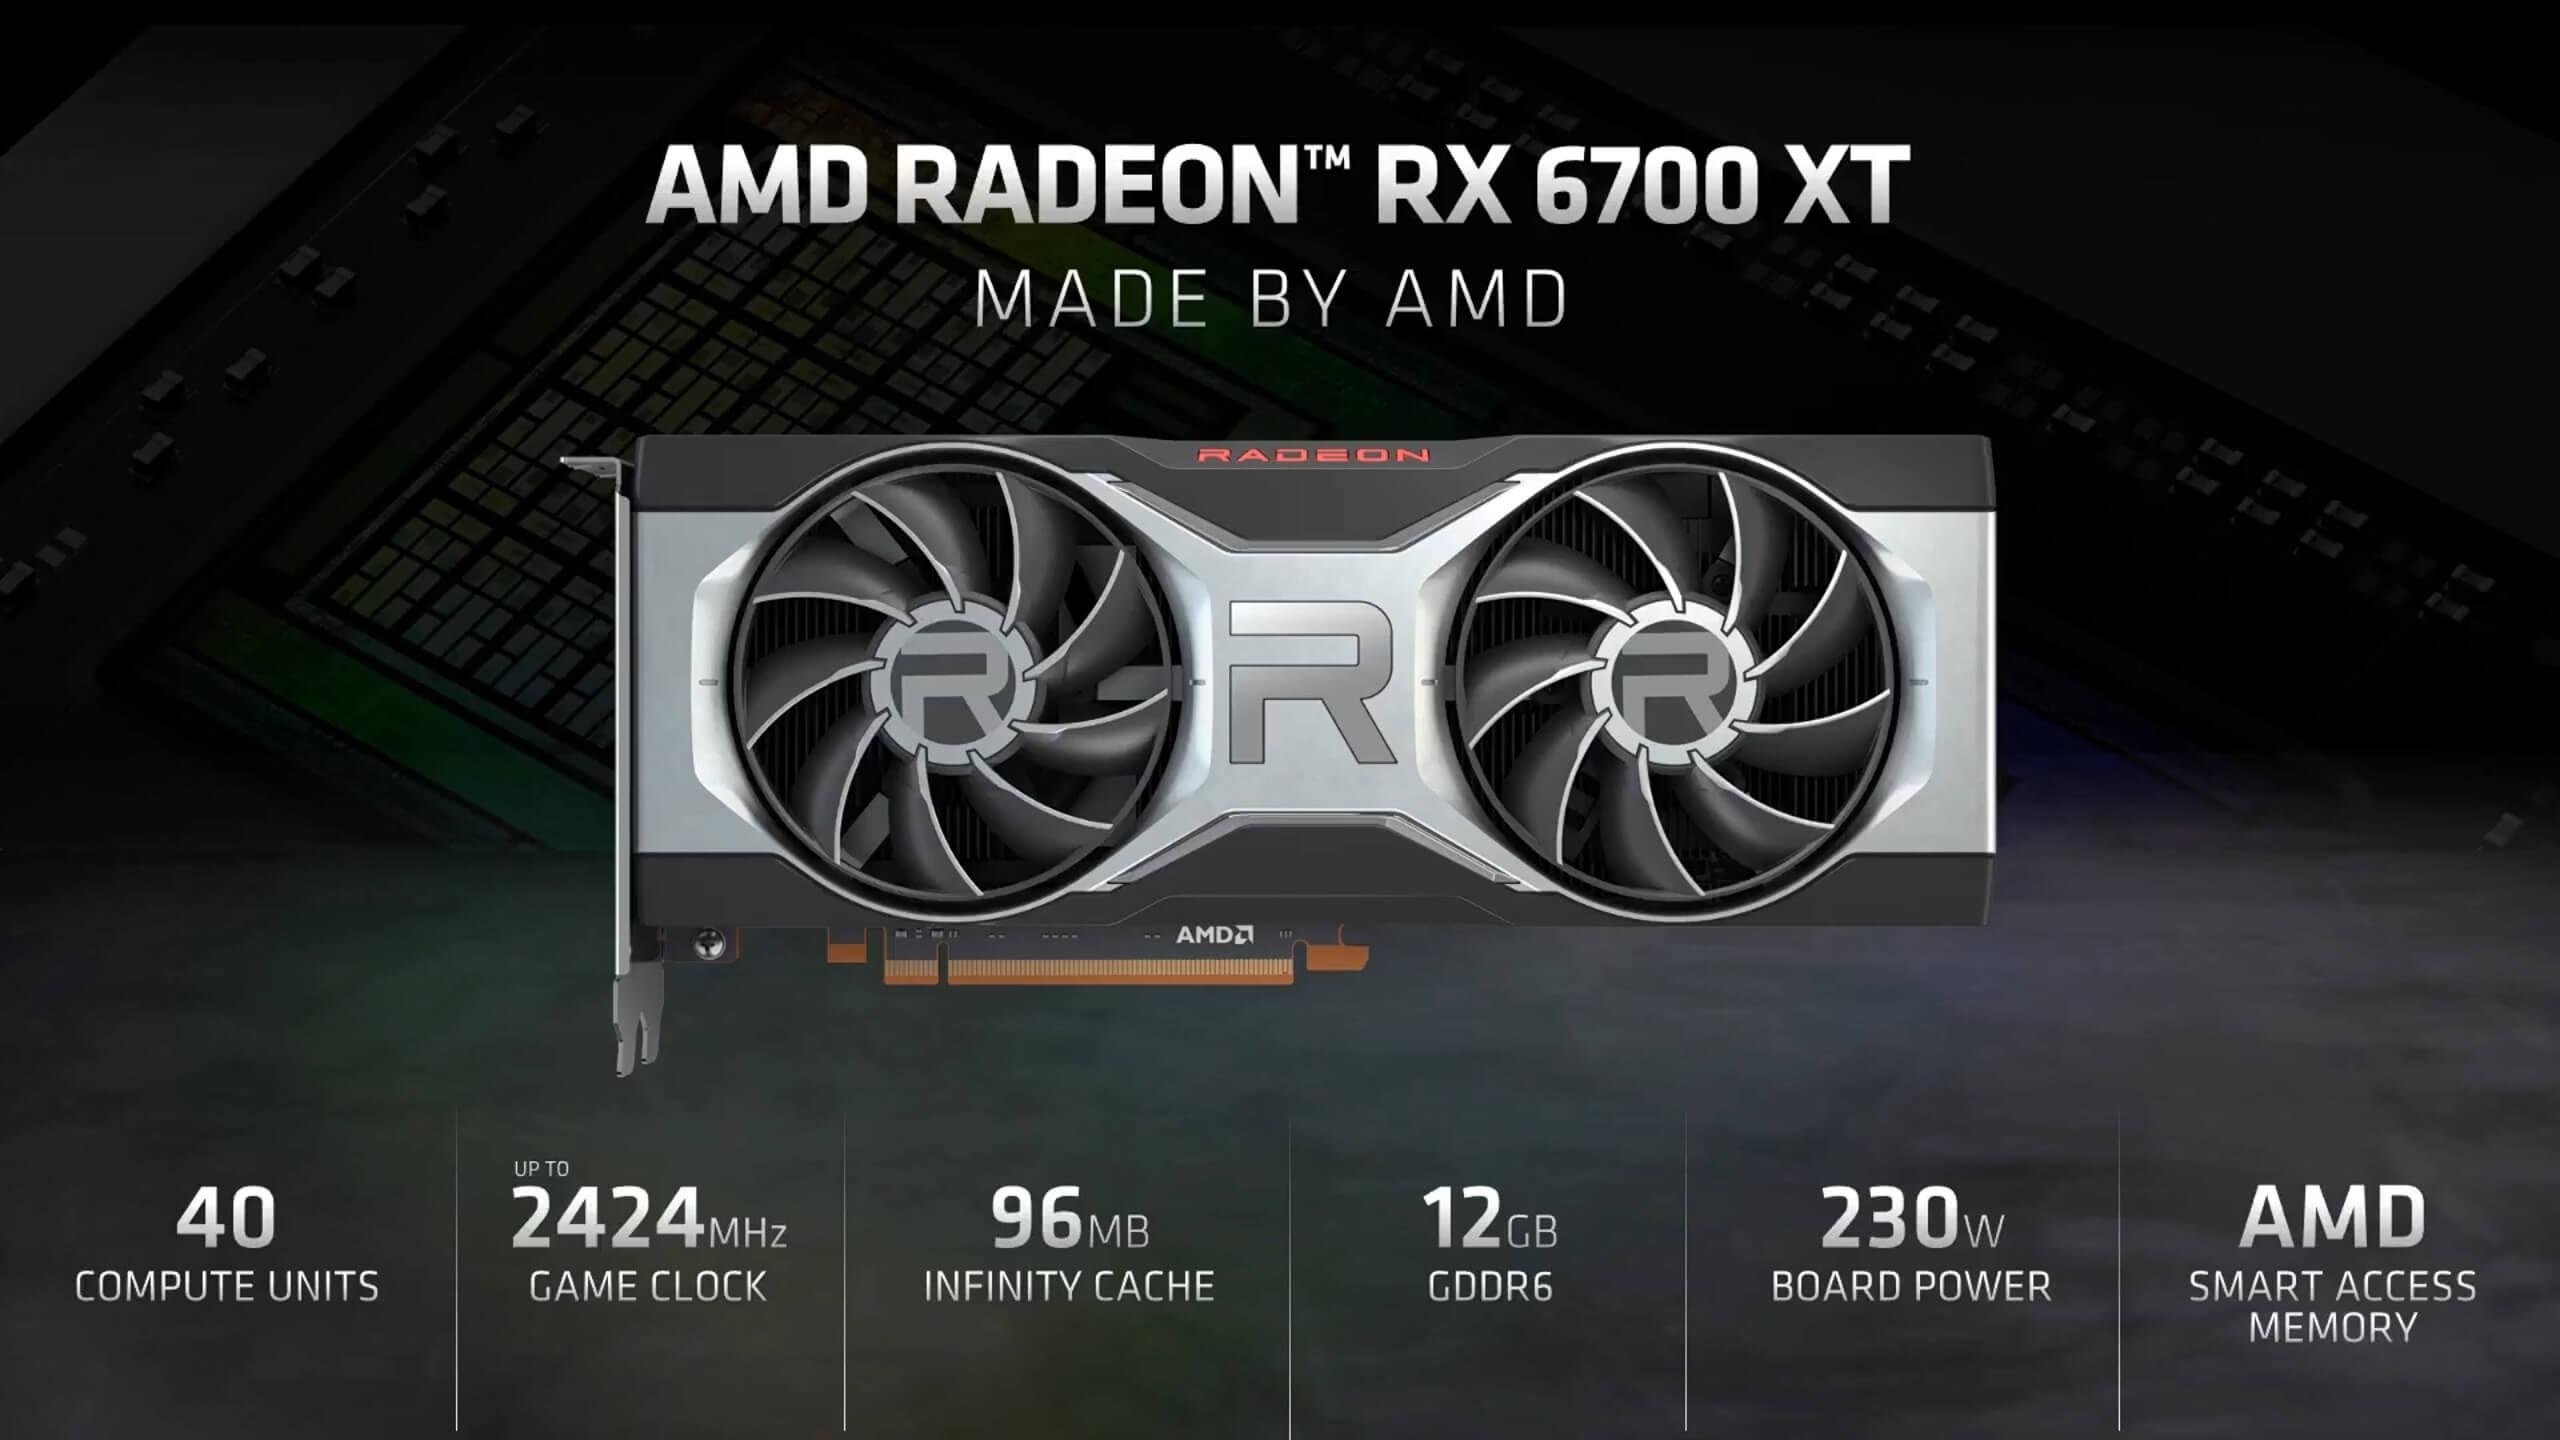 AMD Radeon RX 6700XT slides-2